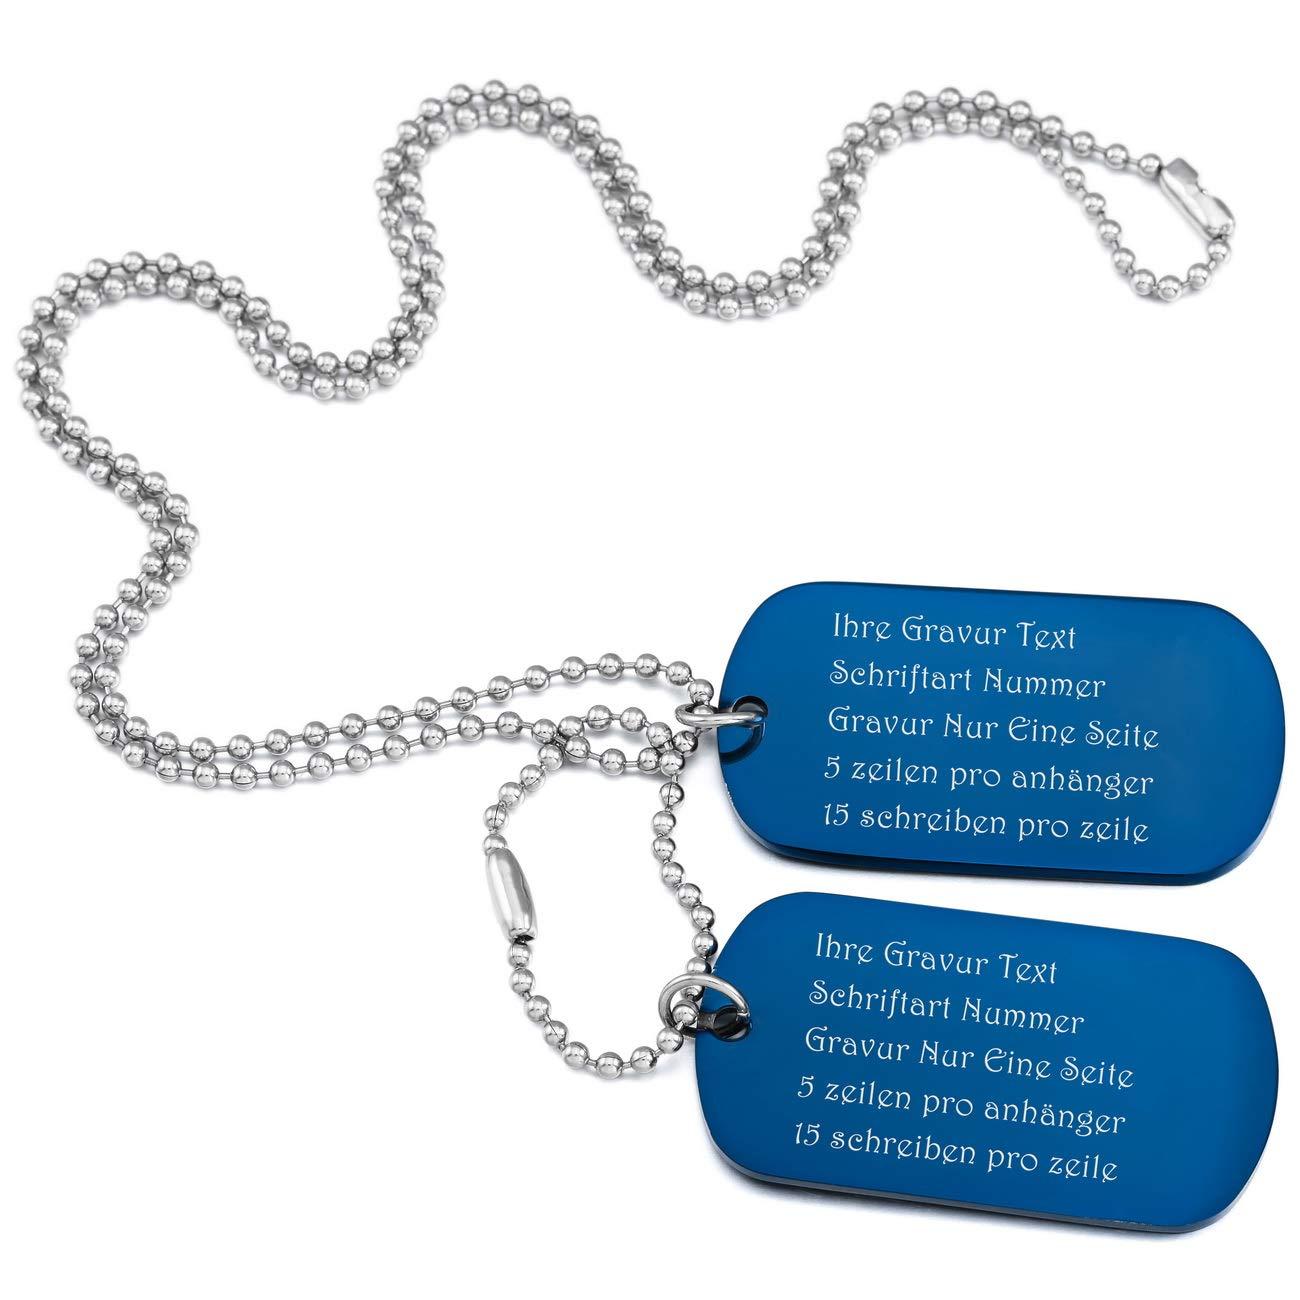 MeMeDIY Edelstahl Anhänger Halskette Doppel Doppelseitig Dog Tag 23 Zoll Kette, mit Kette Gravur de3030072-3